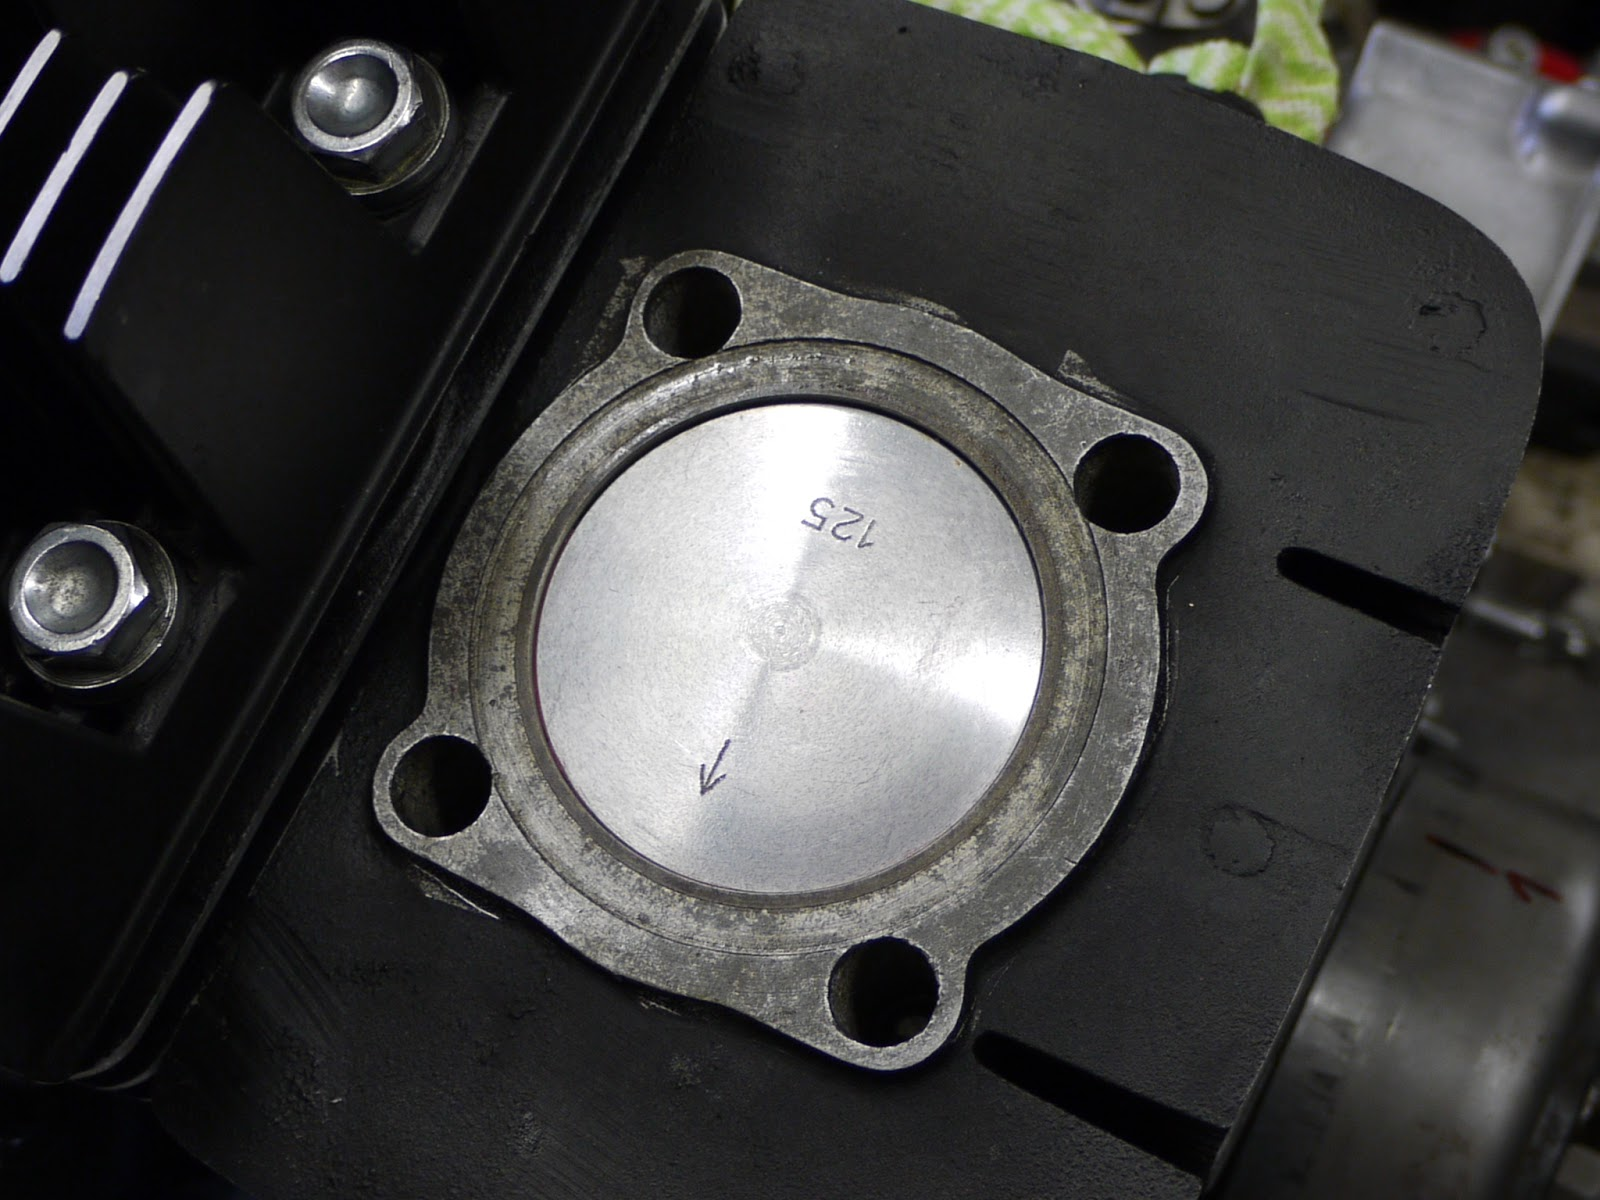 Greasy Greg: Yamaha RD350 squishband tuning (optimization)